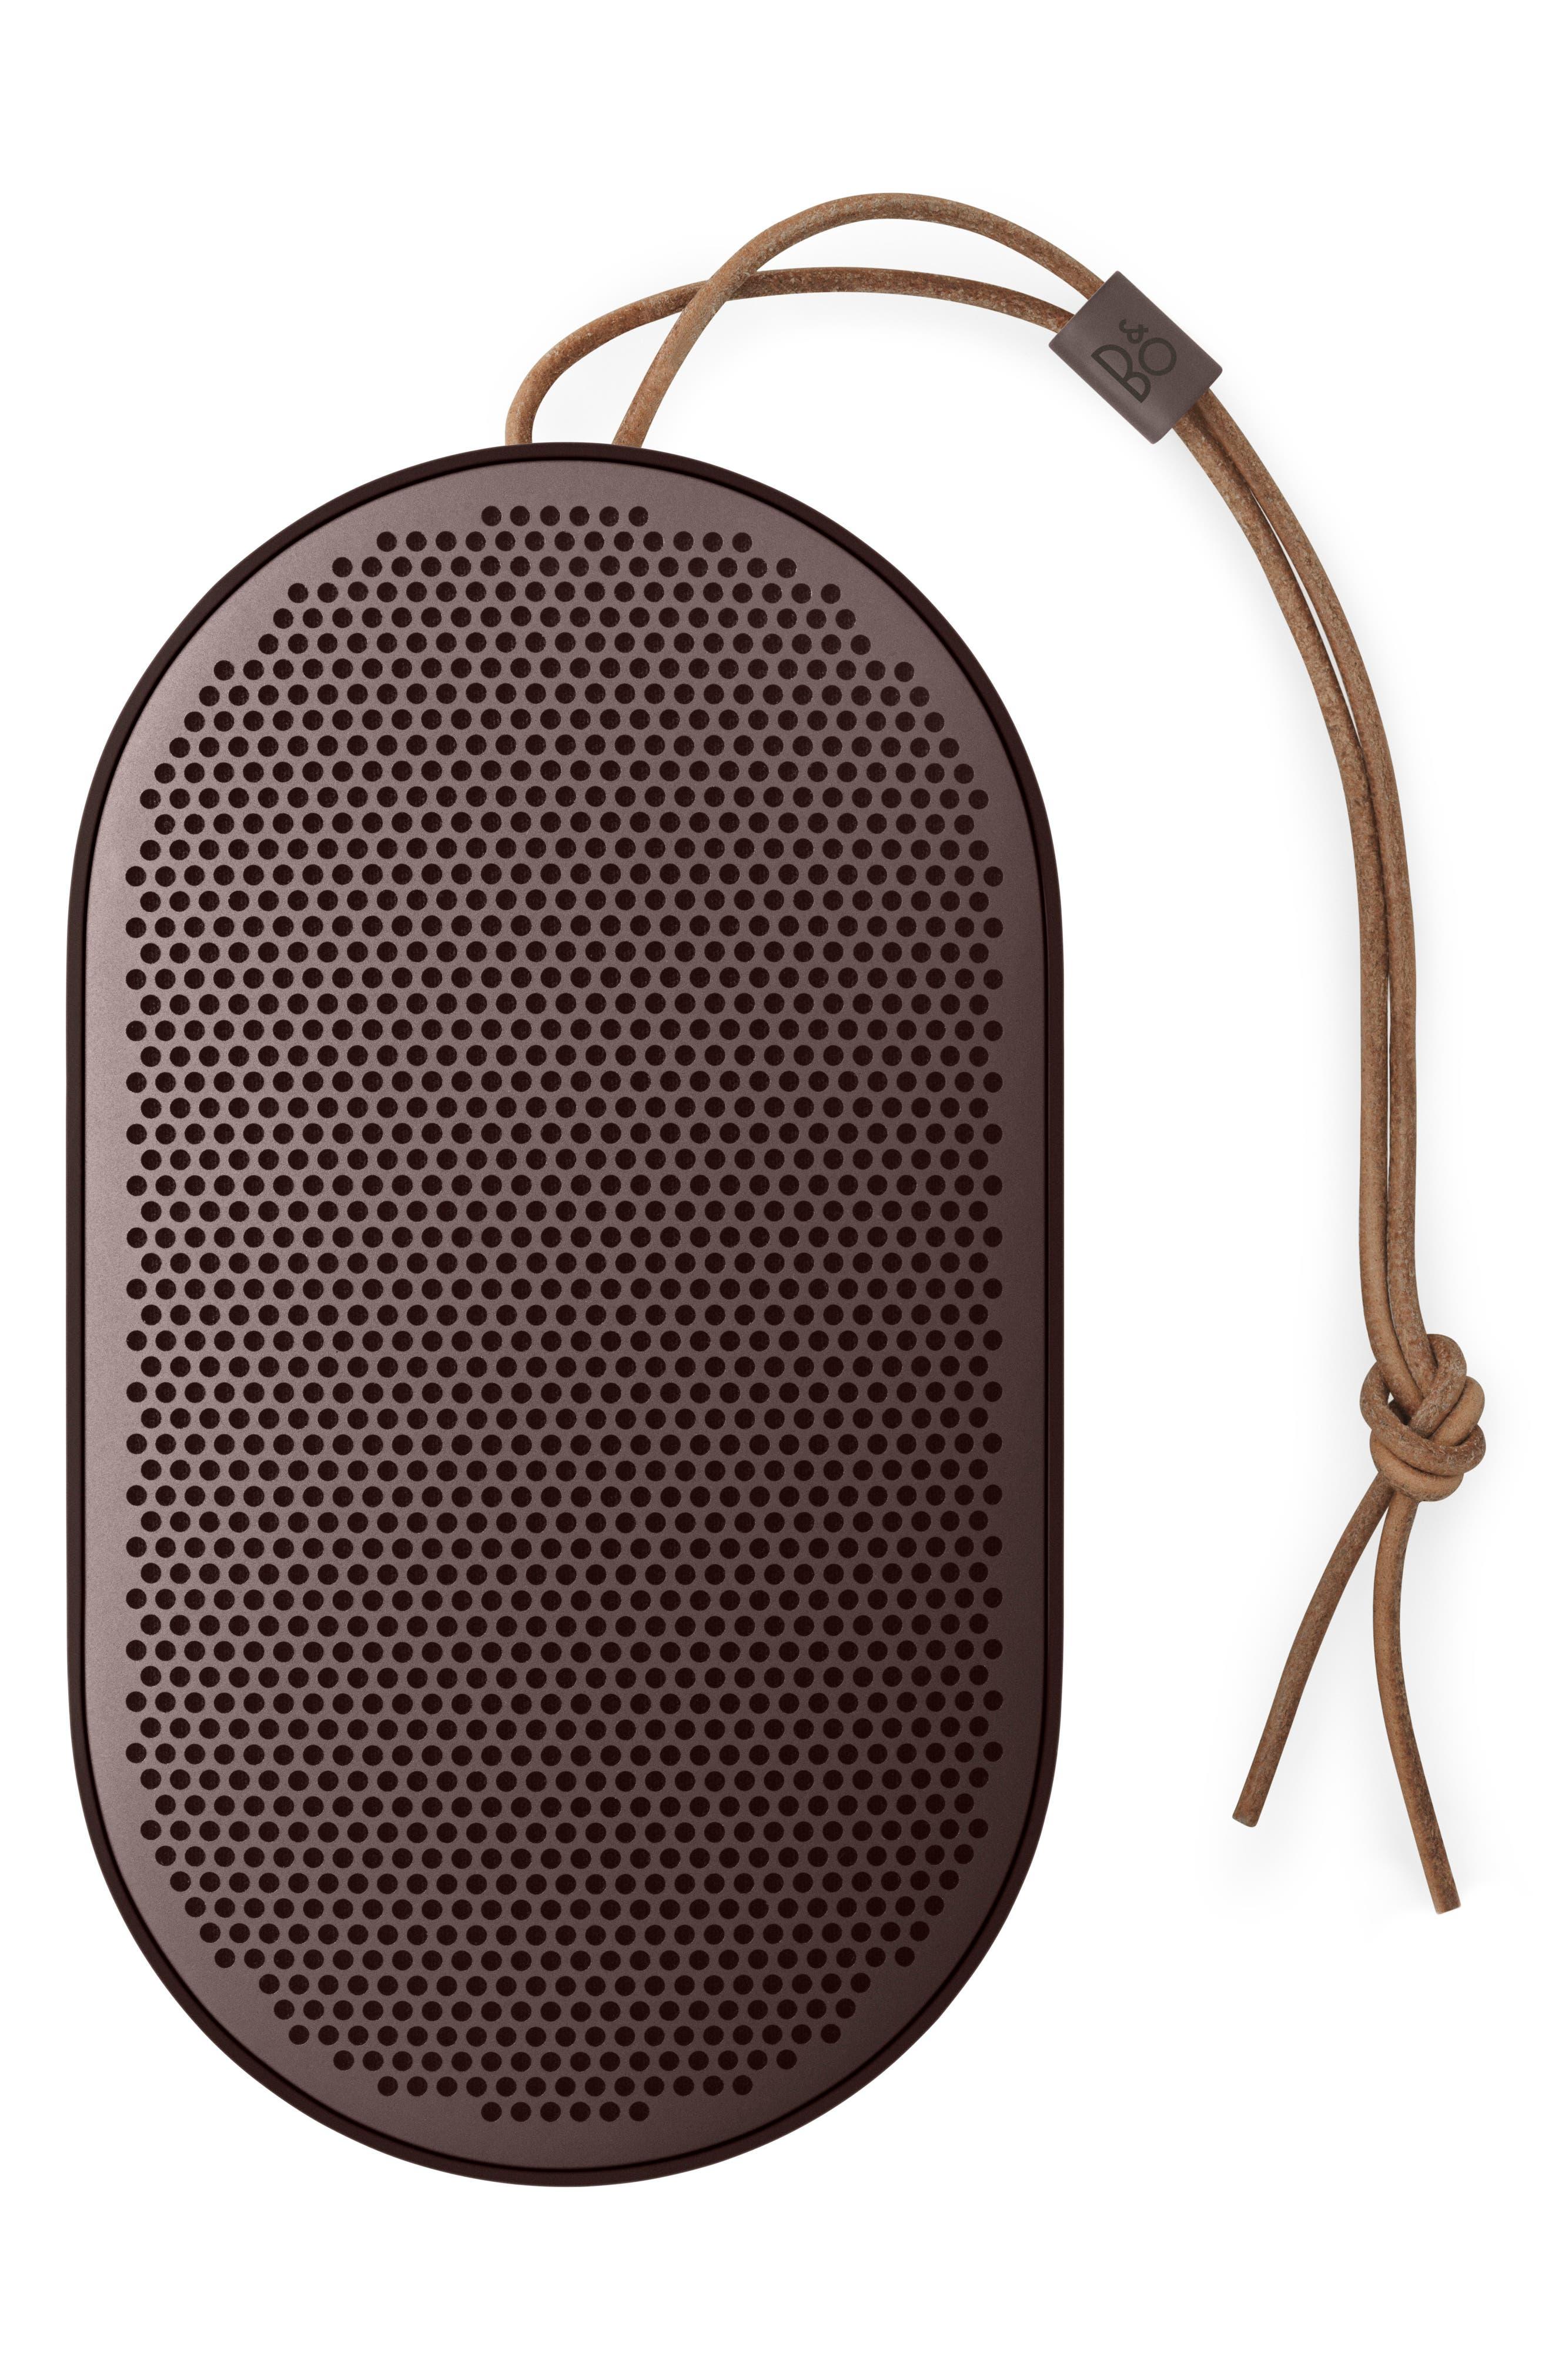 Main Image - B&O Play P2 Personal Bluetooth Speaker